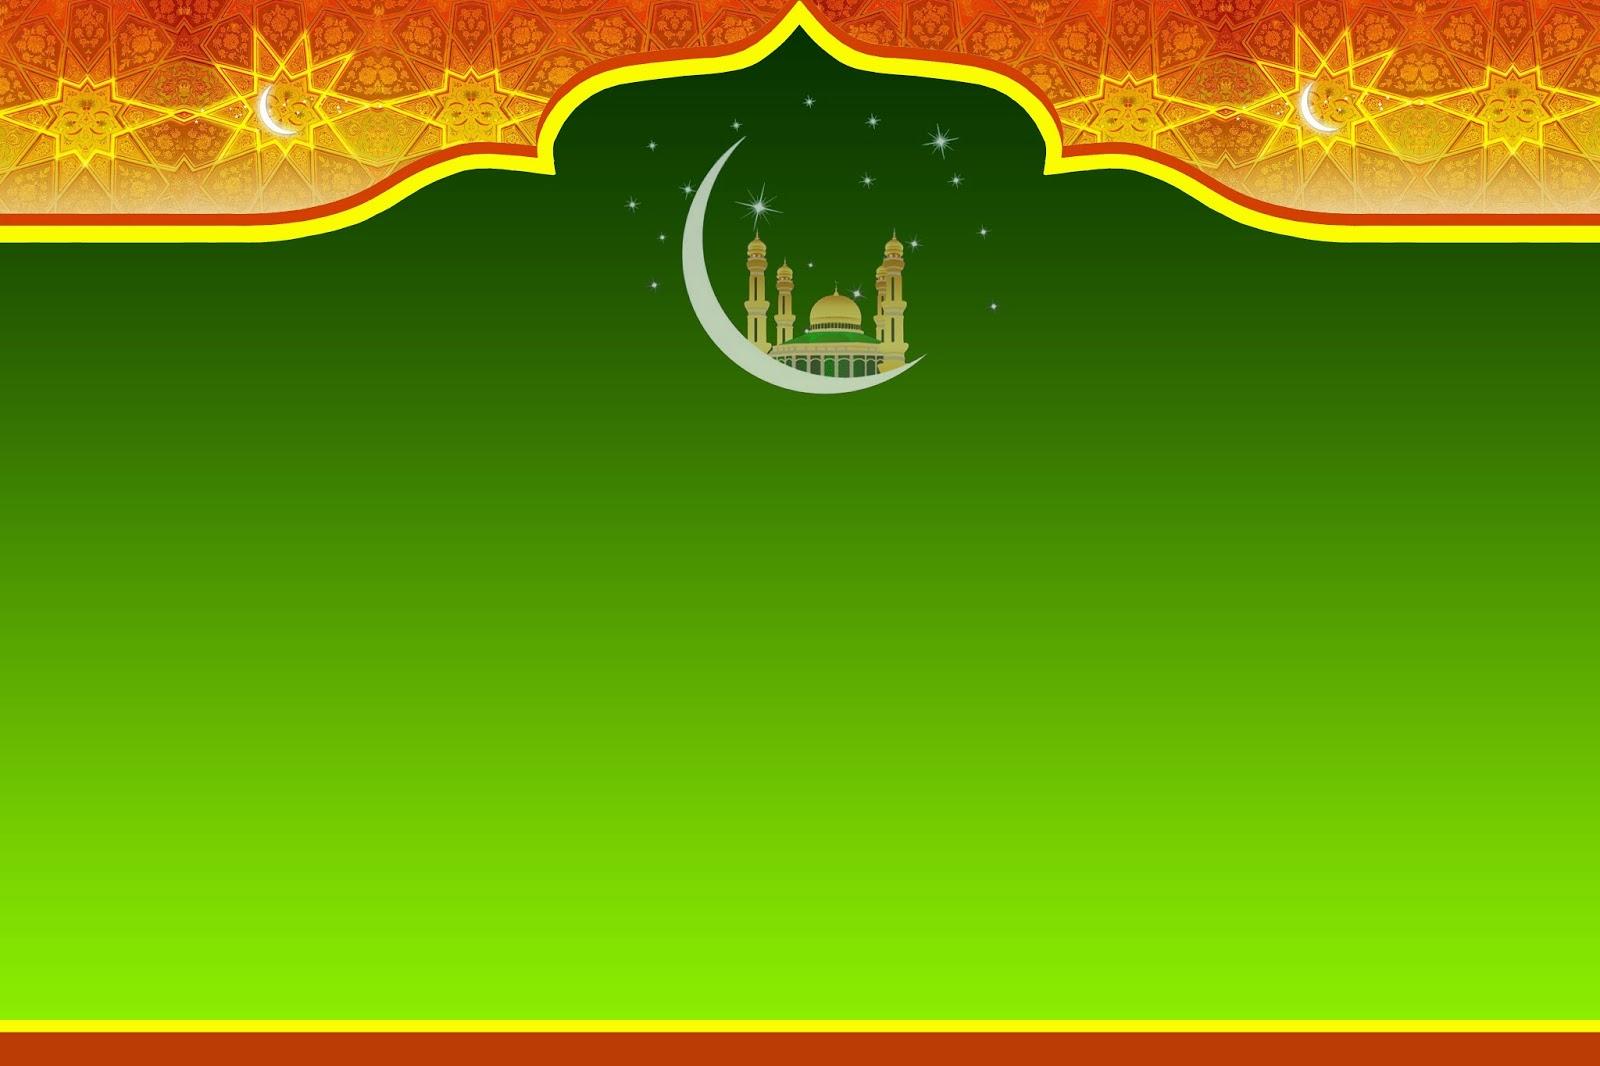 ... islamic background m islamic background p islamic background q